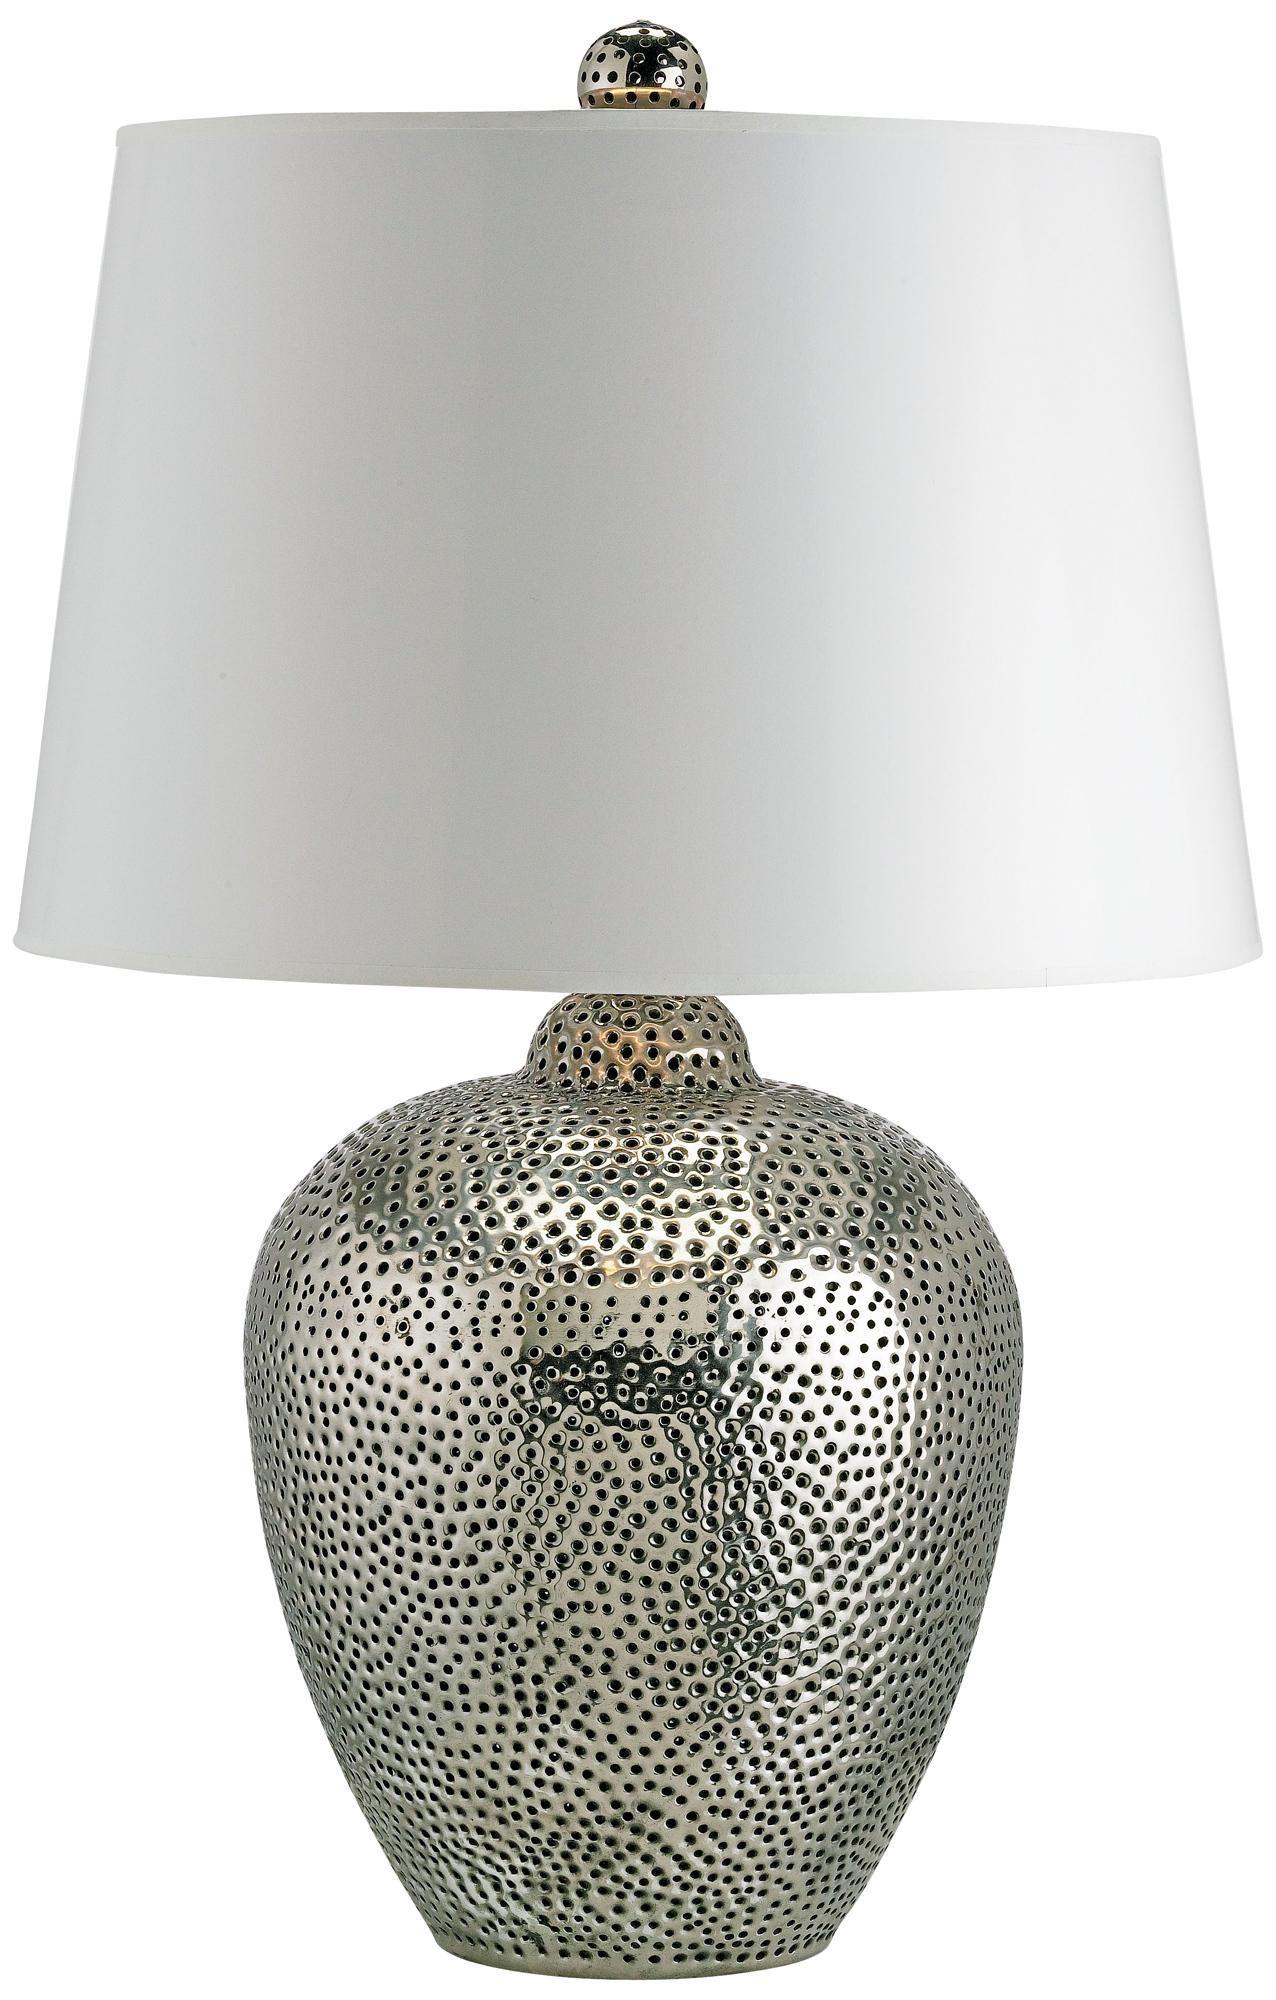 Currey And Company Talisman Hammered Metal Table Lamp Y1487 Lamps Plus Metal Table Lamps Lamp Table Lamp